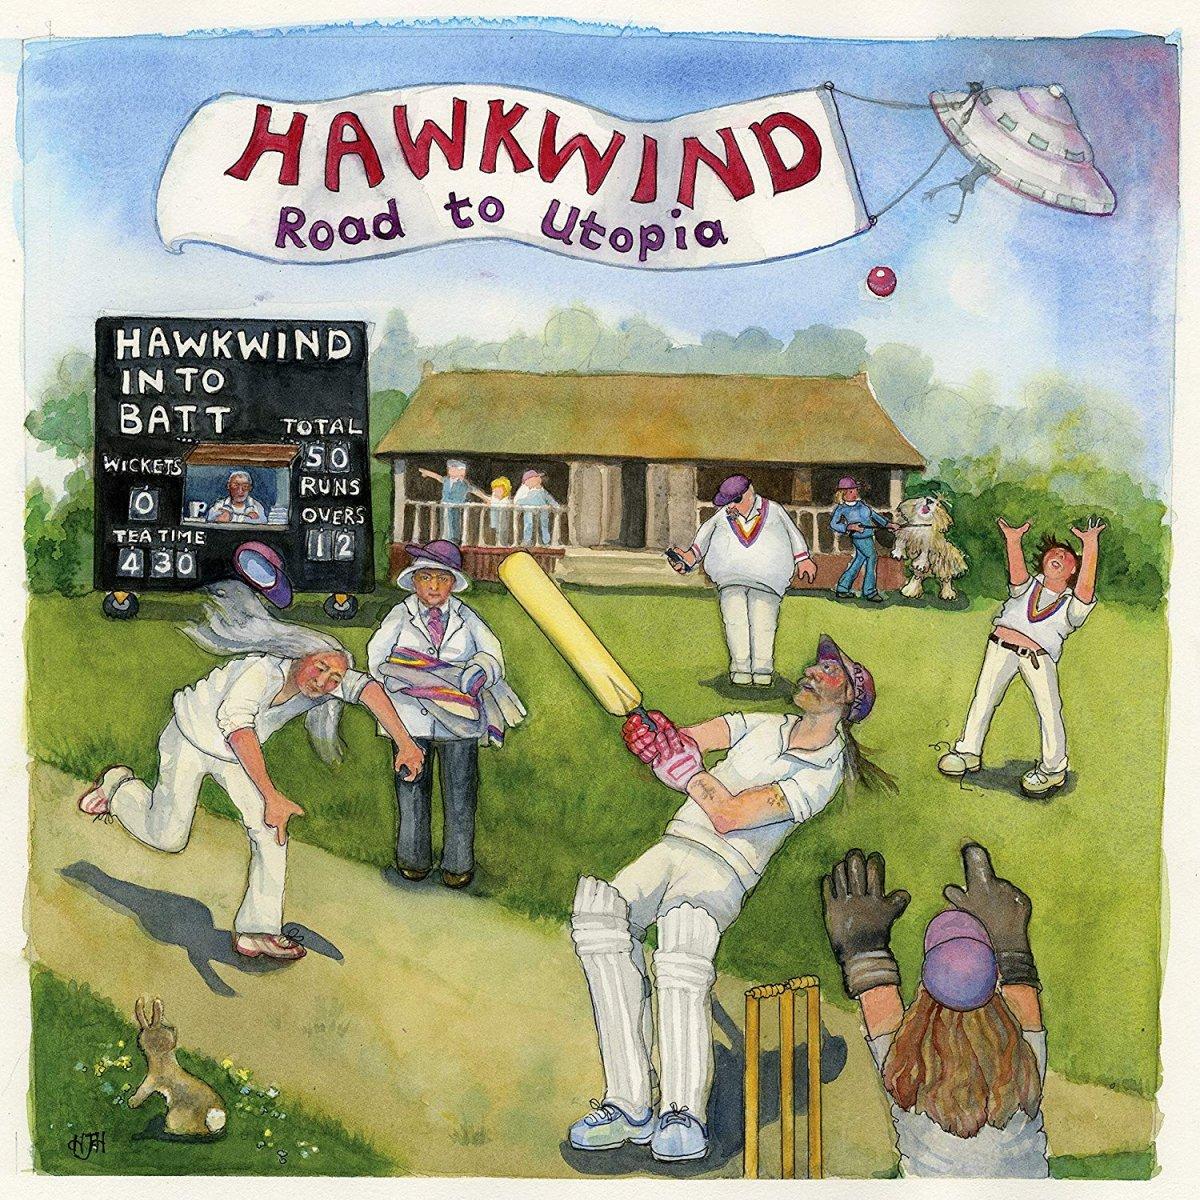 Hawkwind Road To Utopia